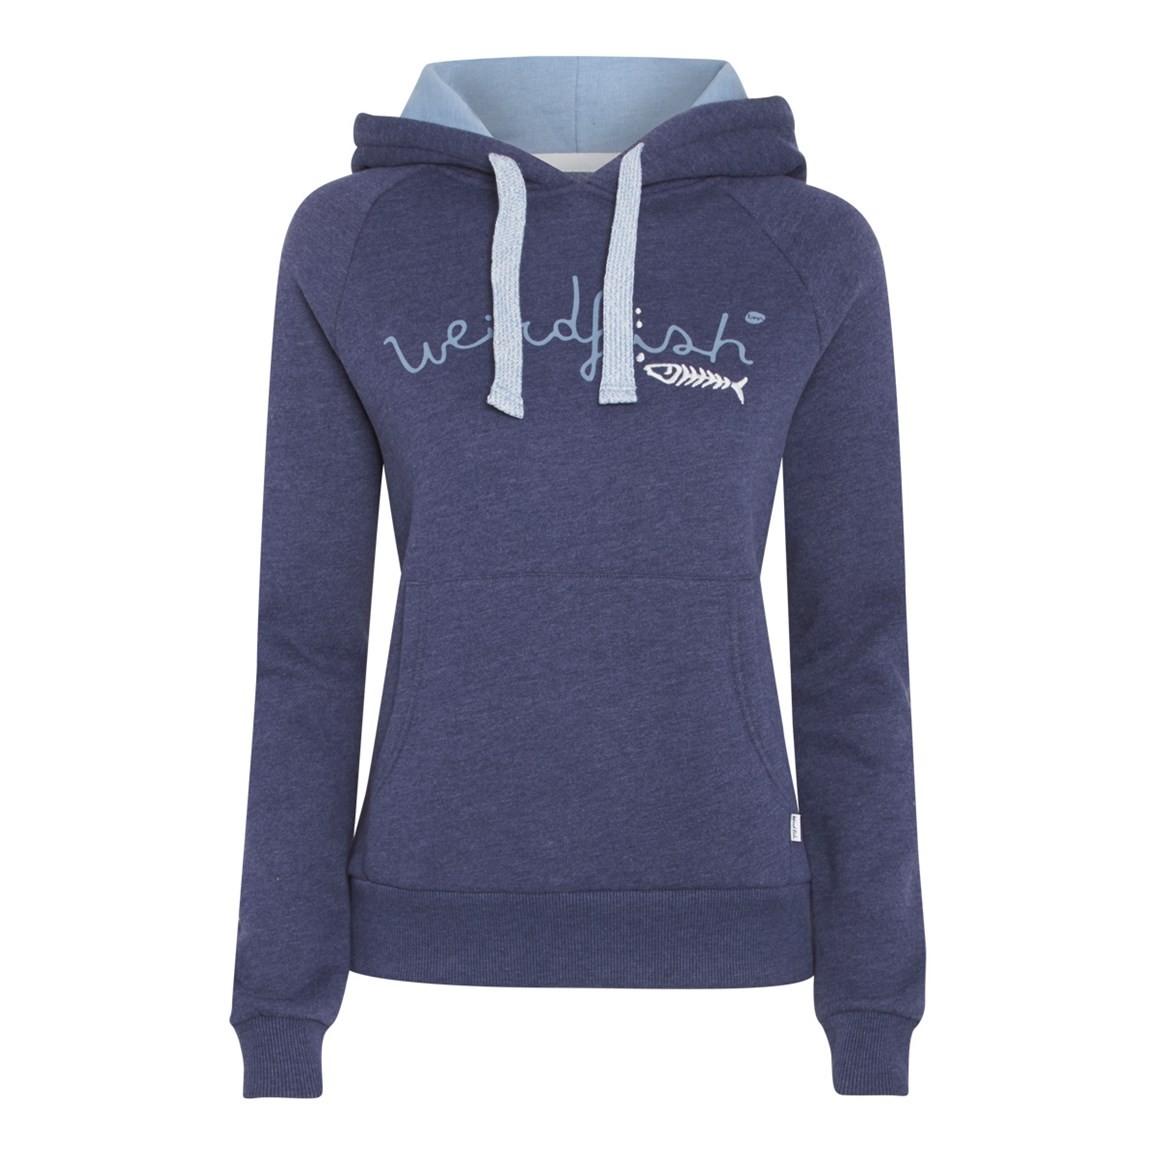 Twilight Branded Graphic Print Hooded Sweatshirt Dark Navy